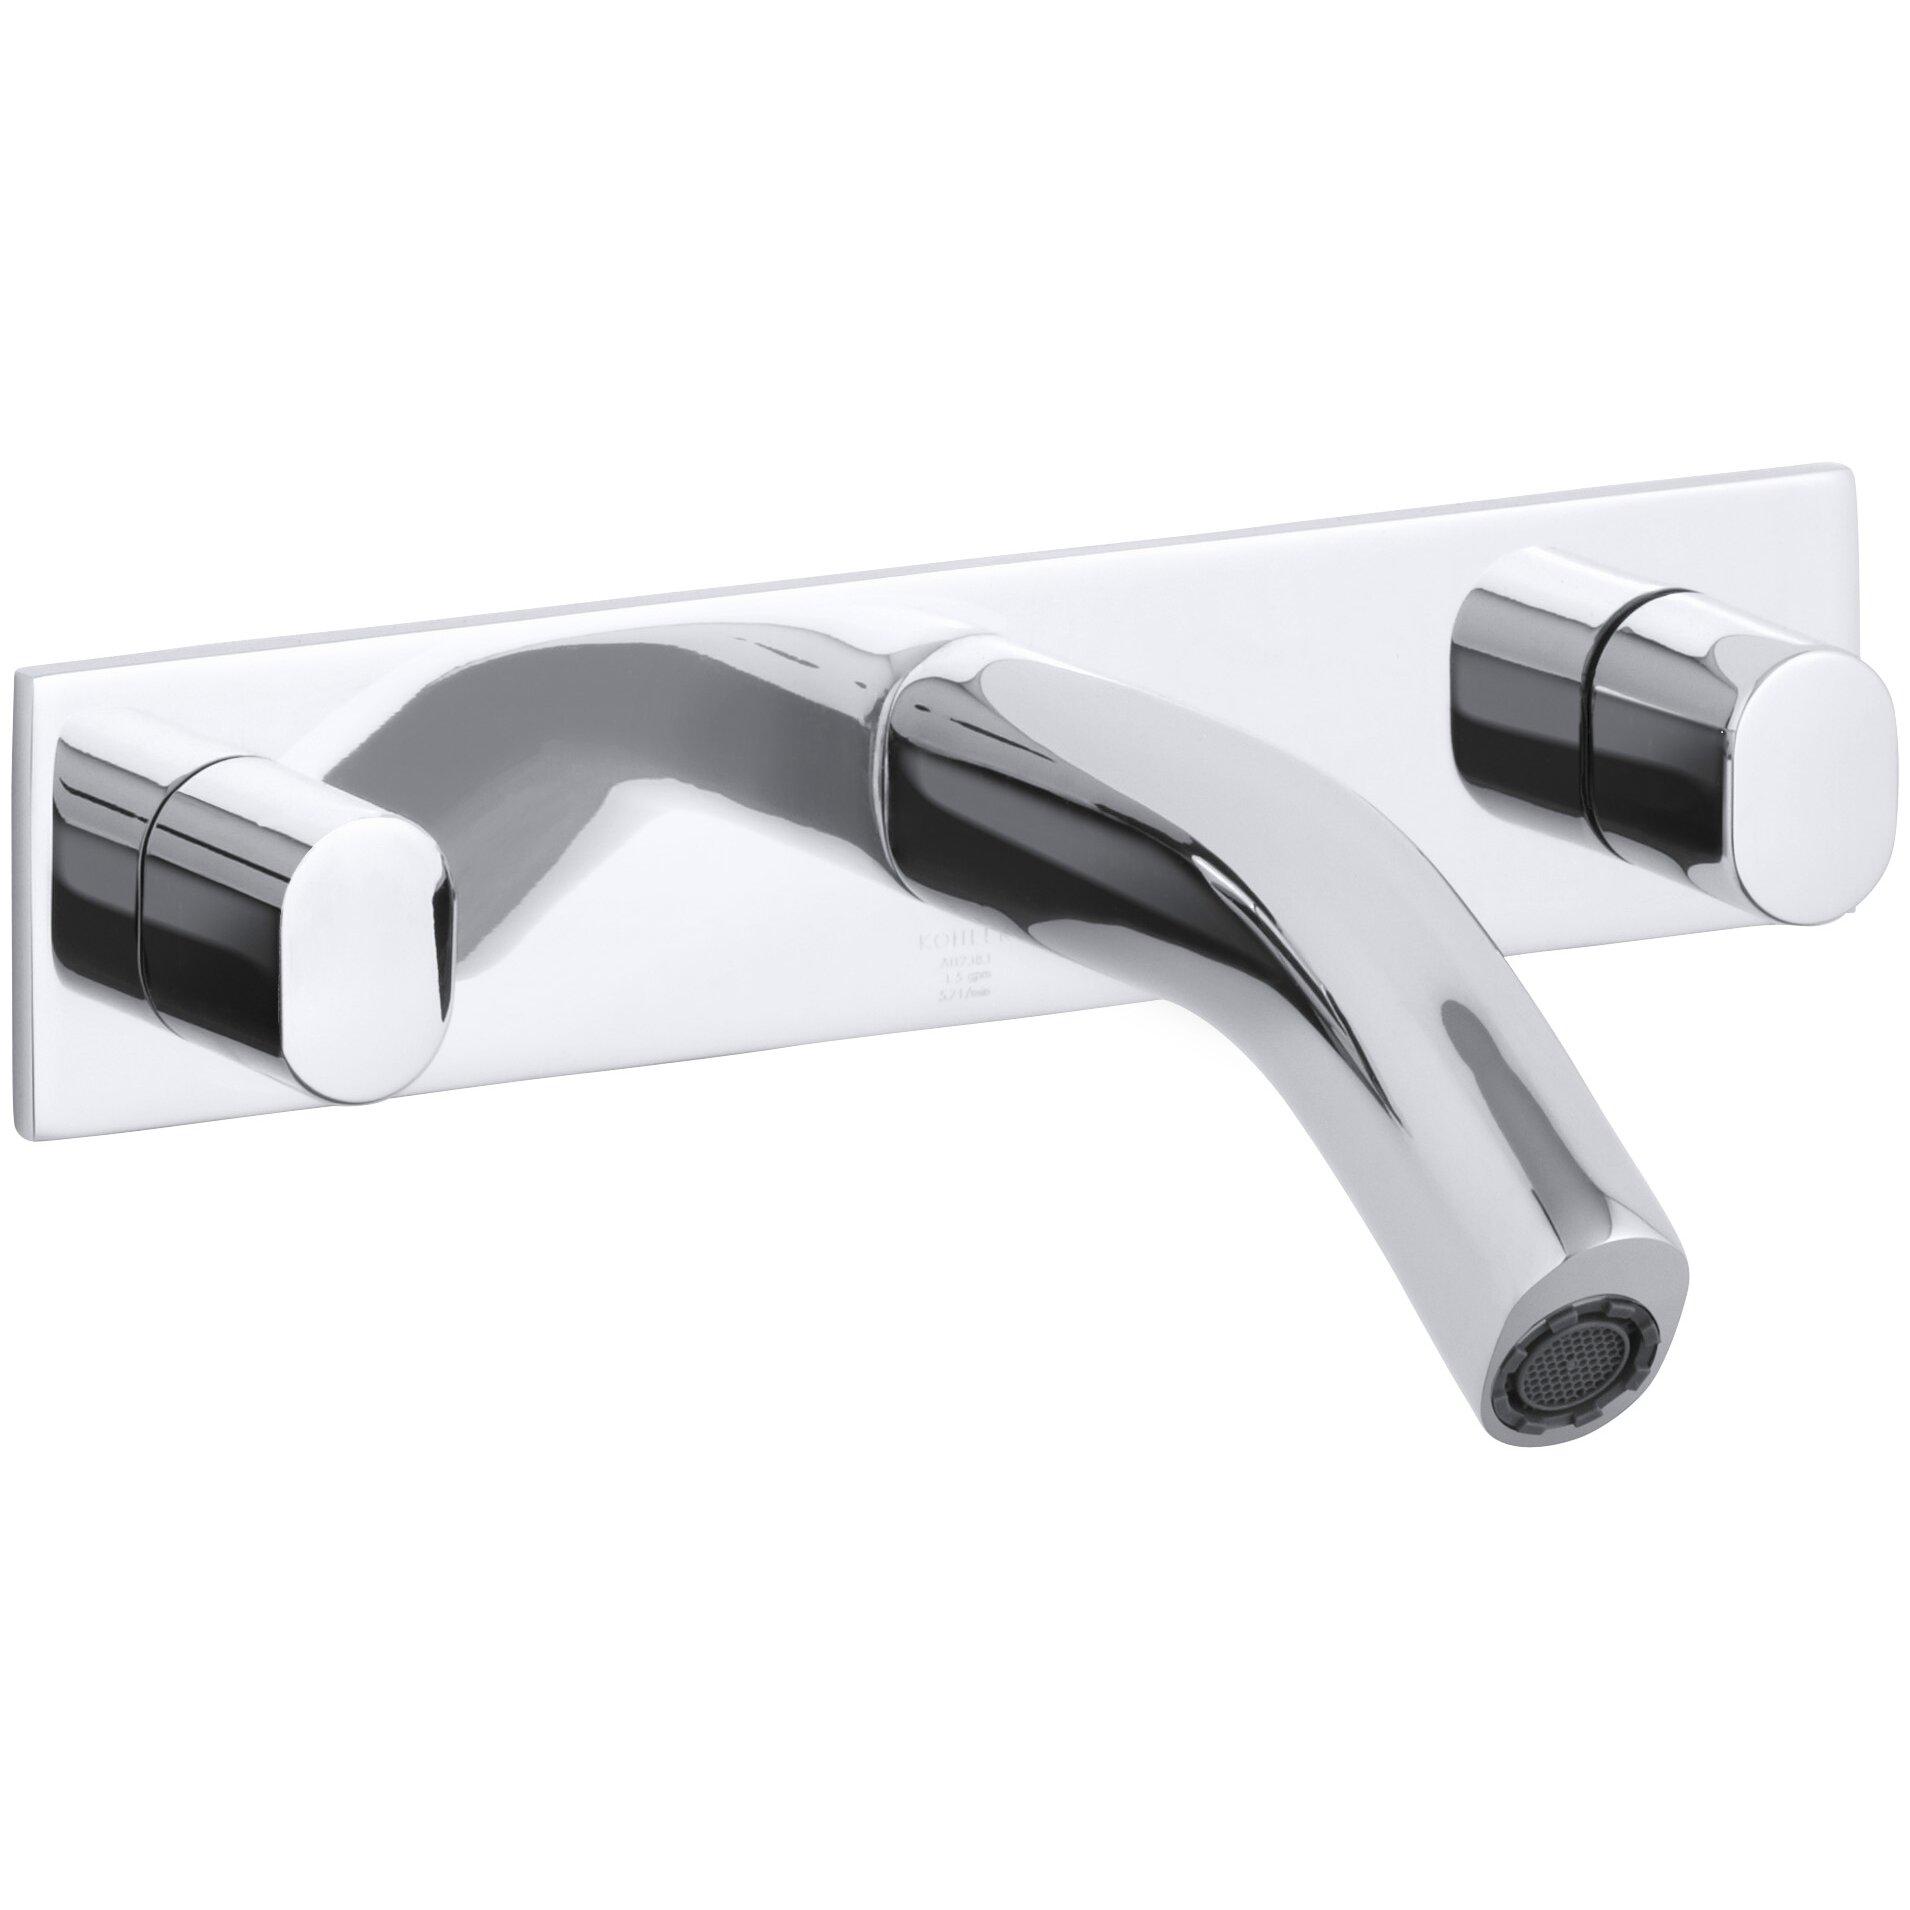 Kohler oblo wall mount bathroom sink faucet wayfair for Kohler wall mount bathroom faucet